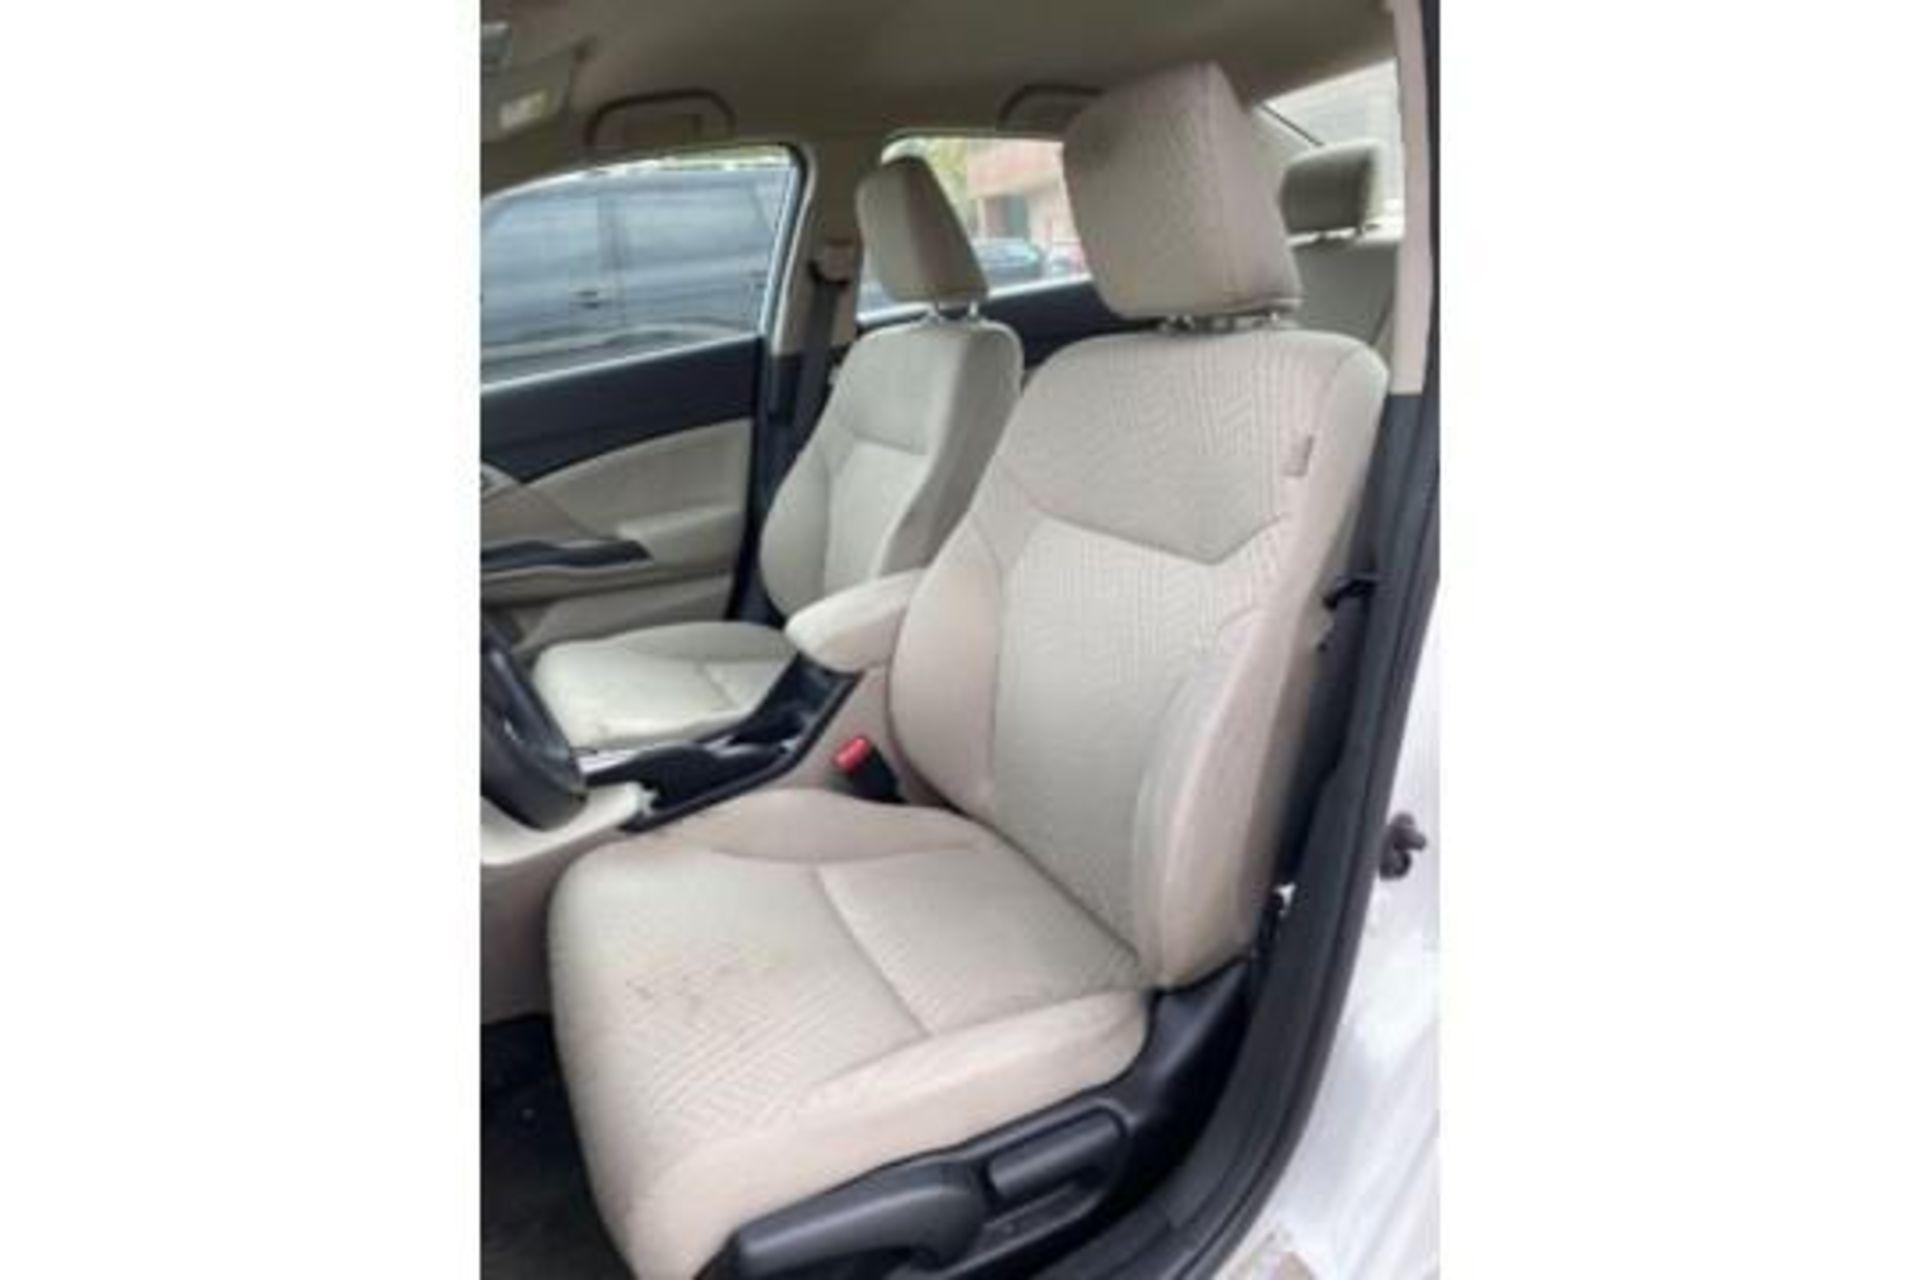 Lot 39C - 2014 HONDA CIVIC 4-DOOR SEDAN, NATURAL GAS, AUTOMATIC WINDOWS AND LOCKS, RUNS & DRIVES